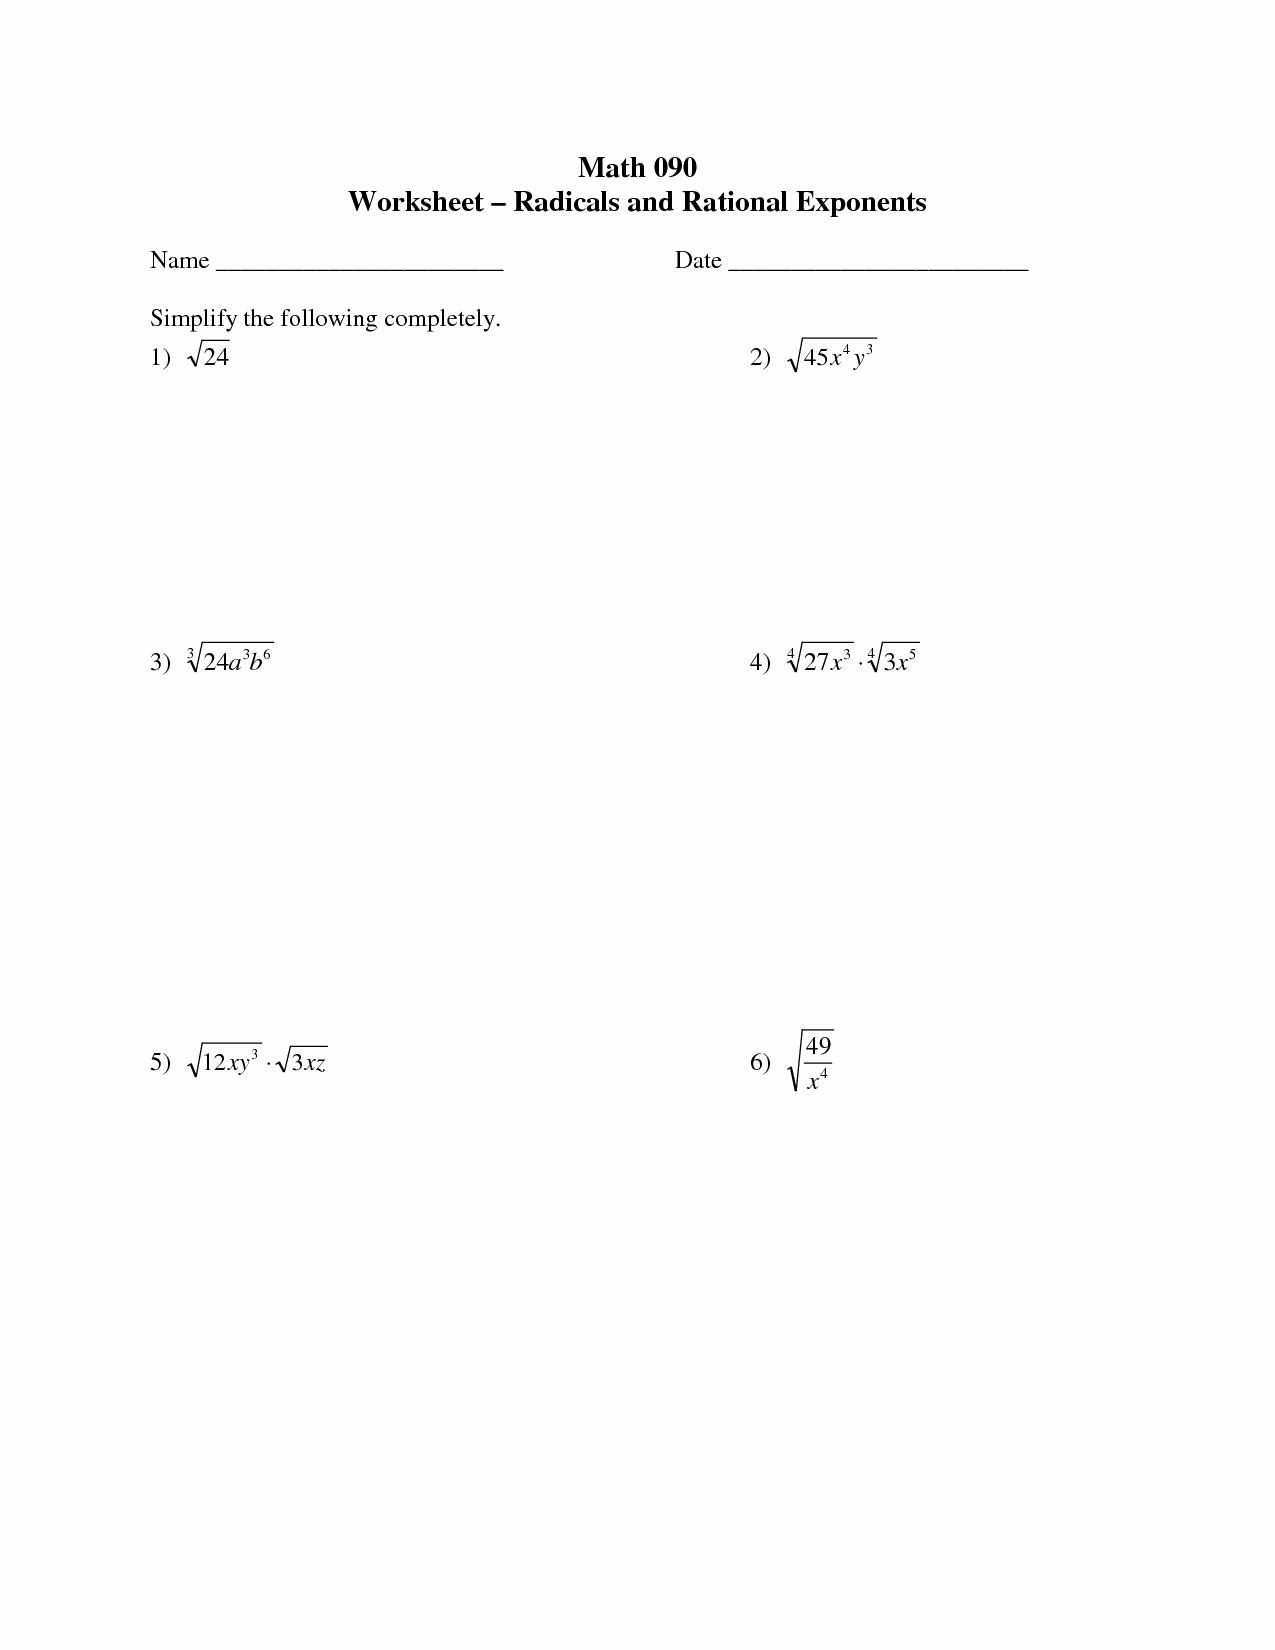 Radicals and Rational Exponents Worksheet Unique 17 Best Of Algebra 1 Radicals Worksheet 7th Grade